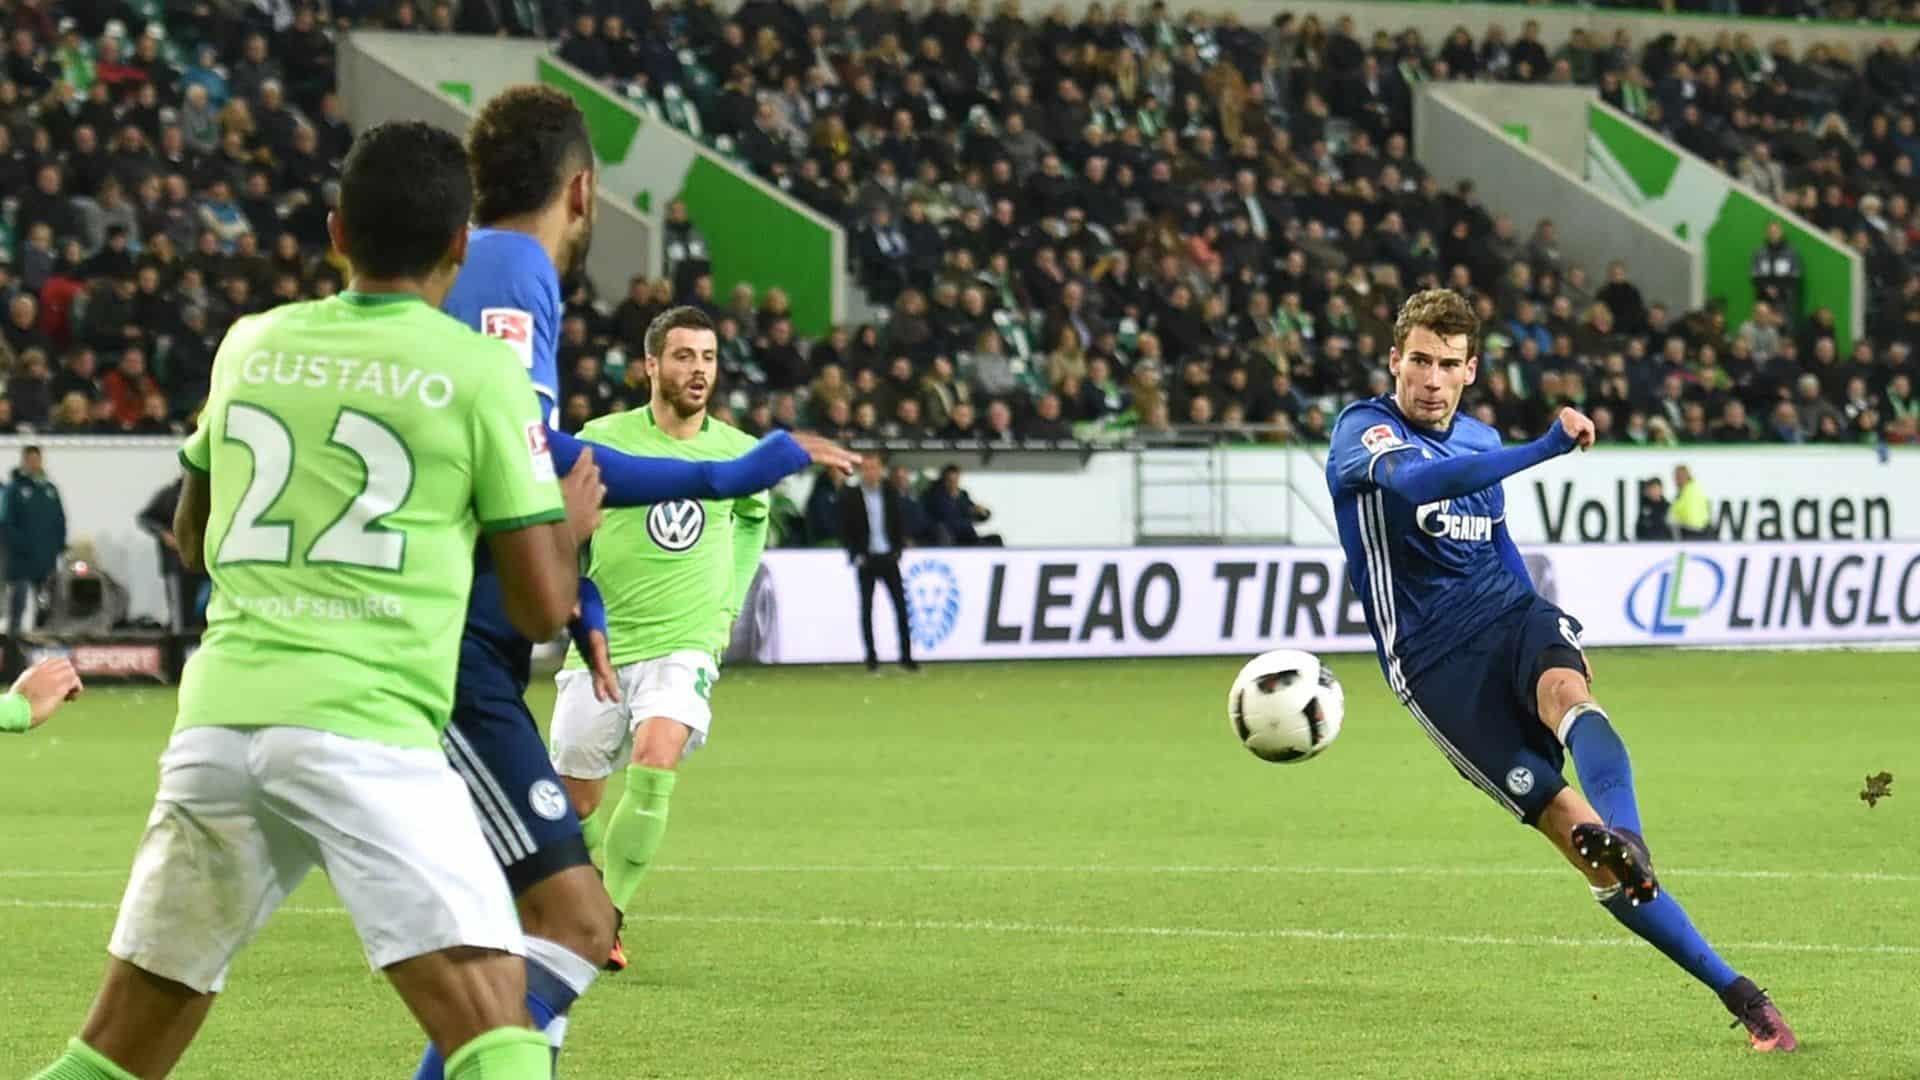 Prediksi Norimberga vs Schalke 04